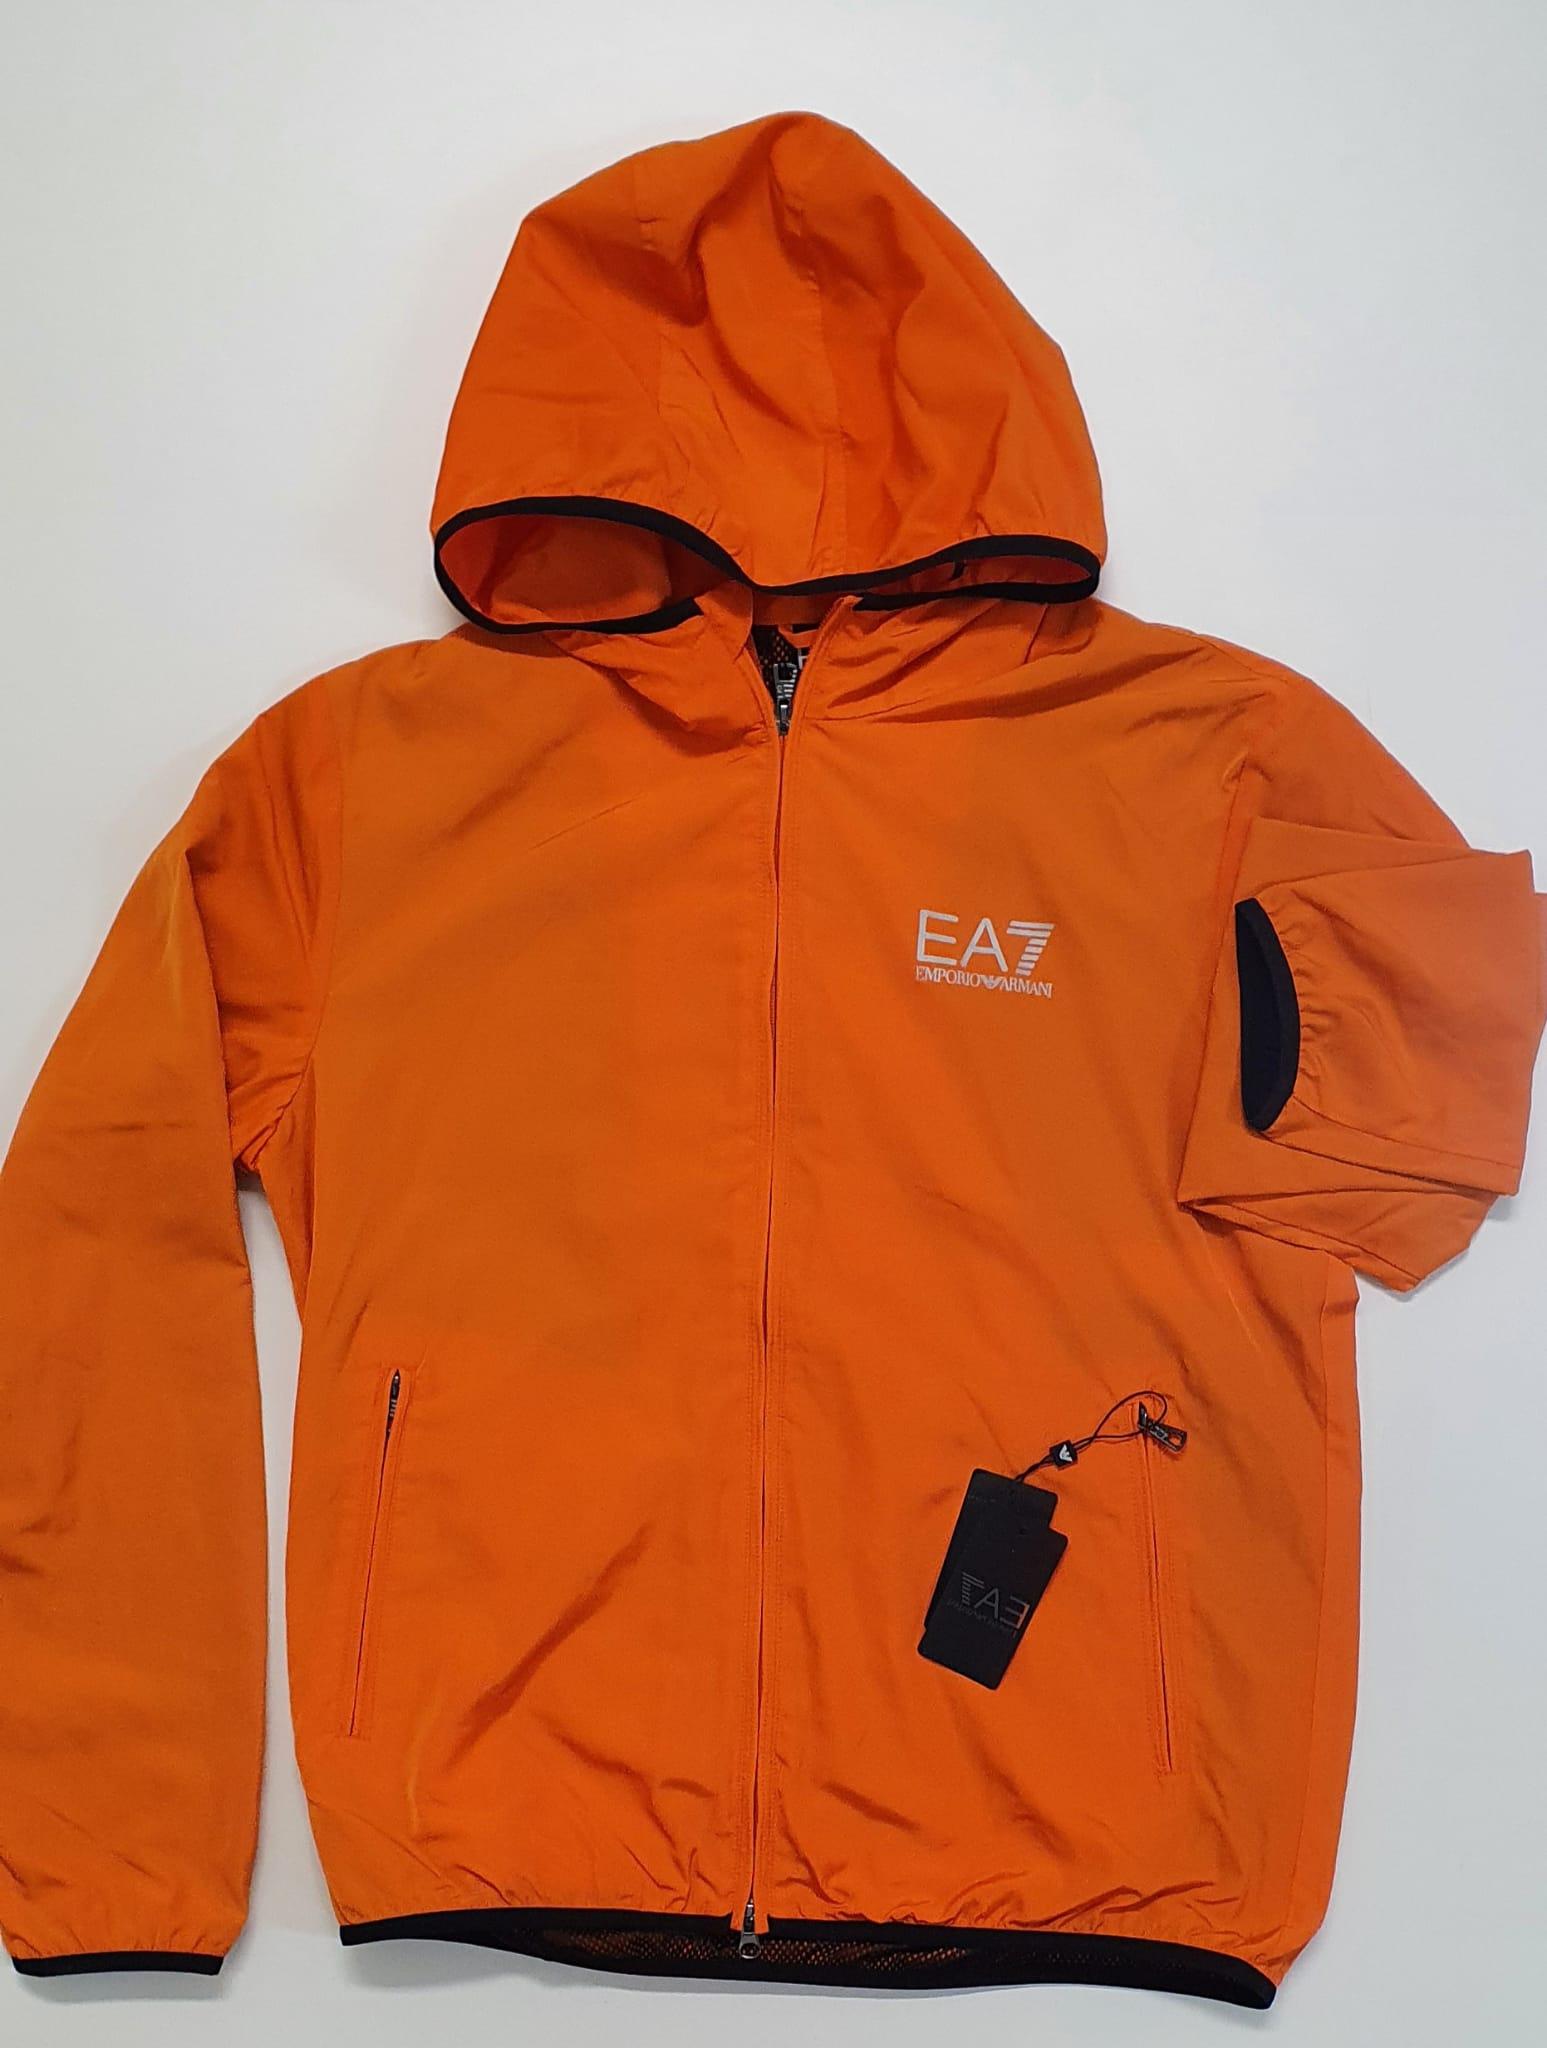 Giubbino Ea7 Liscio con Cappuccio Arancio